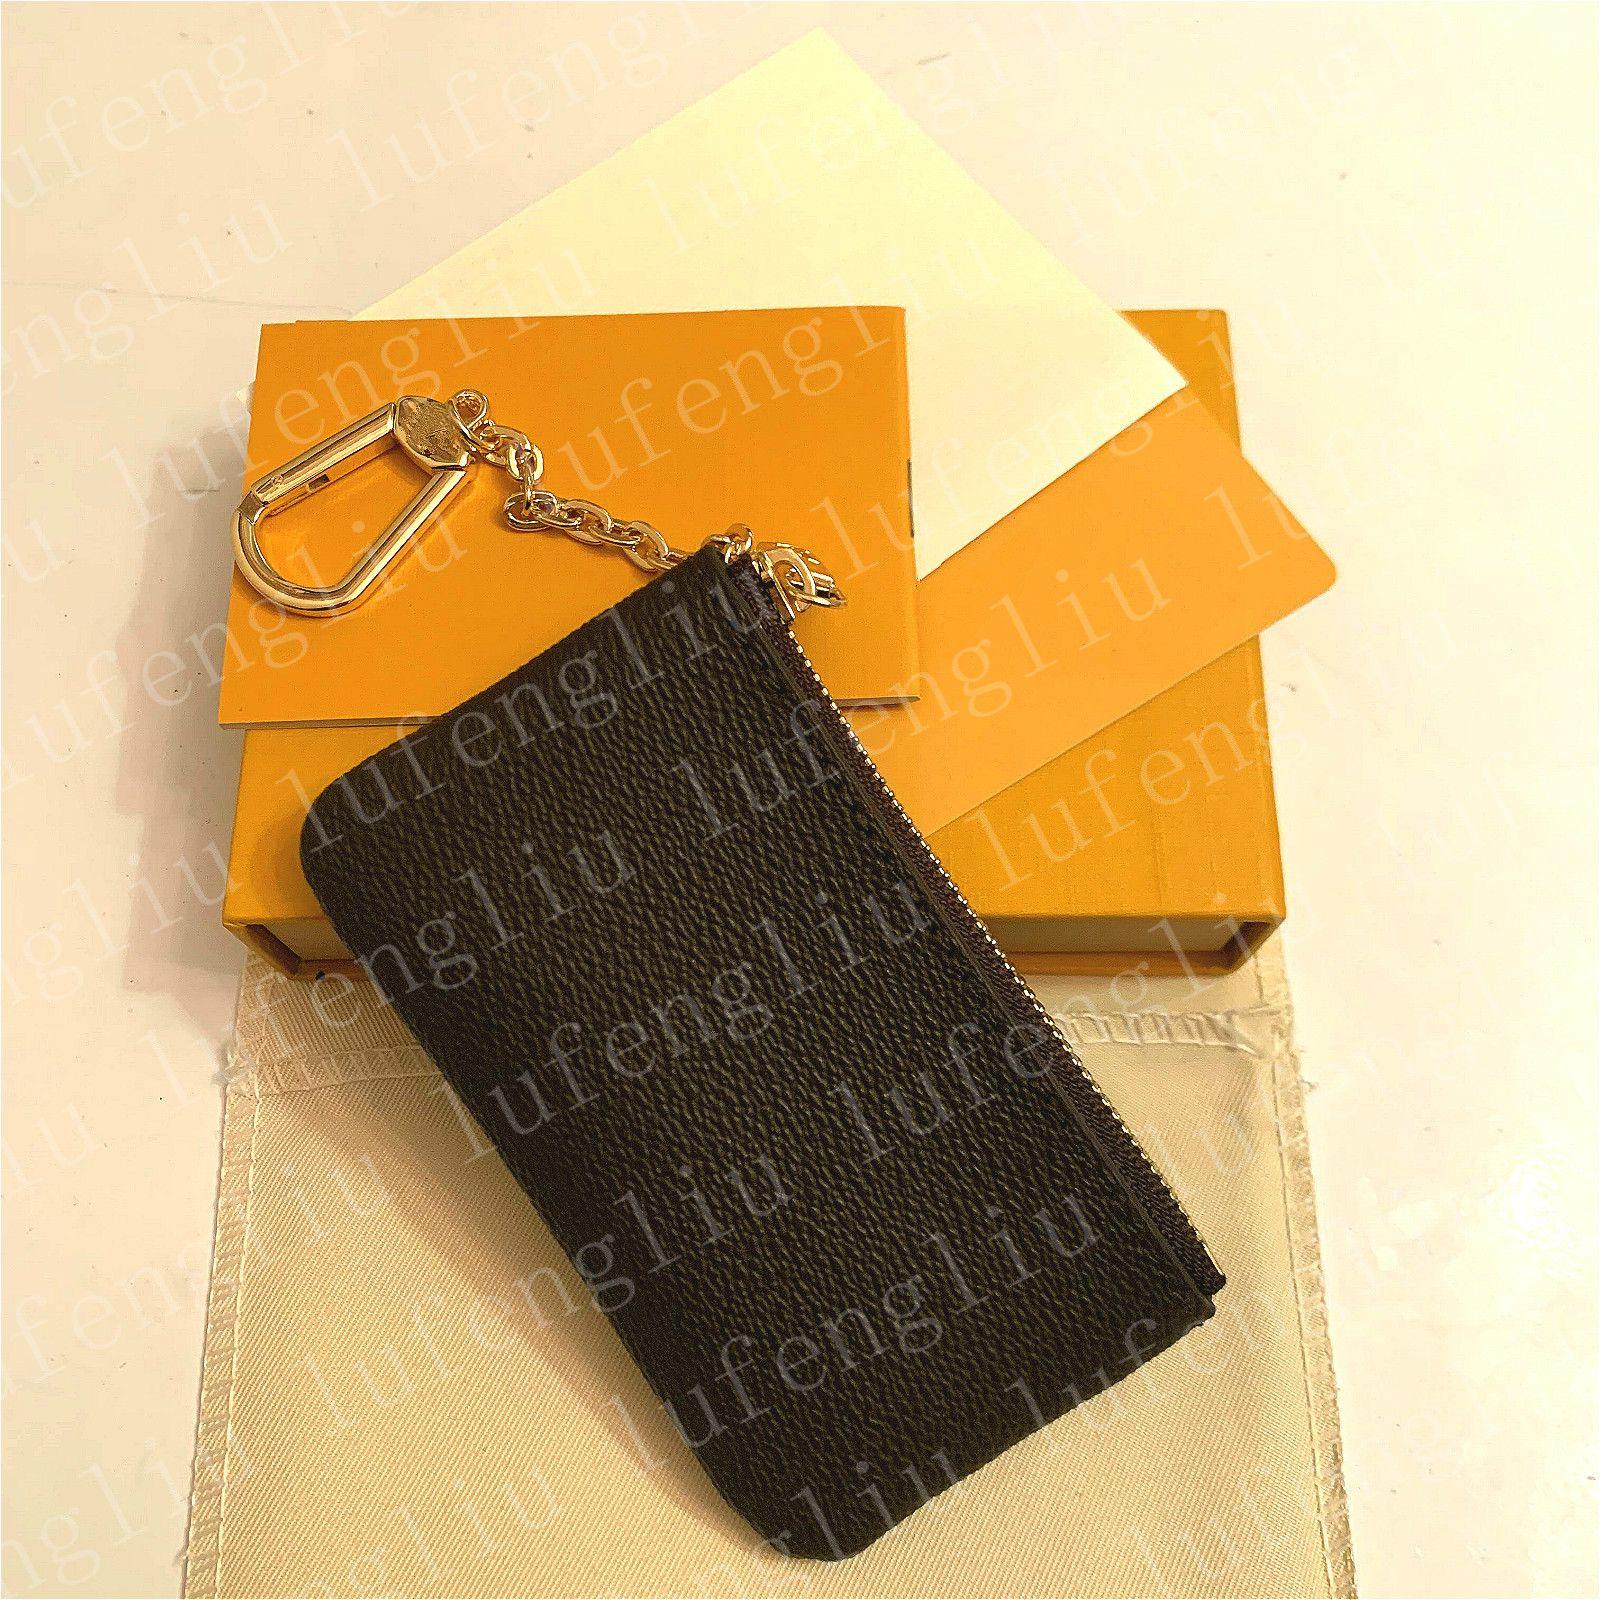 Luxurys 디자이너 키 지갑 동전 동전 지갑 지갑 Mens Key Pouch Womens Card 홀더 핸드백 가죽 카드 미니 지갑 코인 지갑 클러치